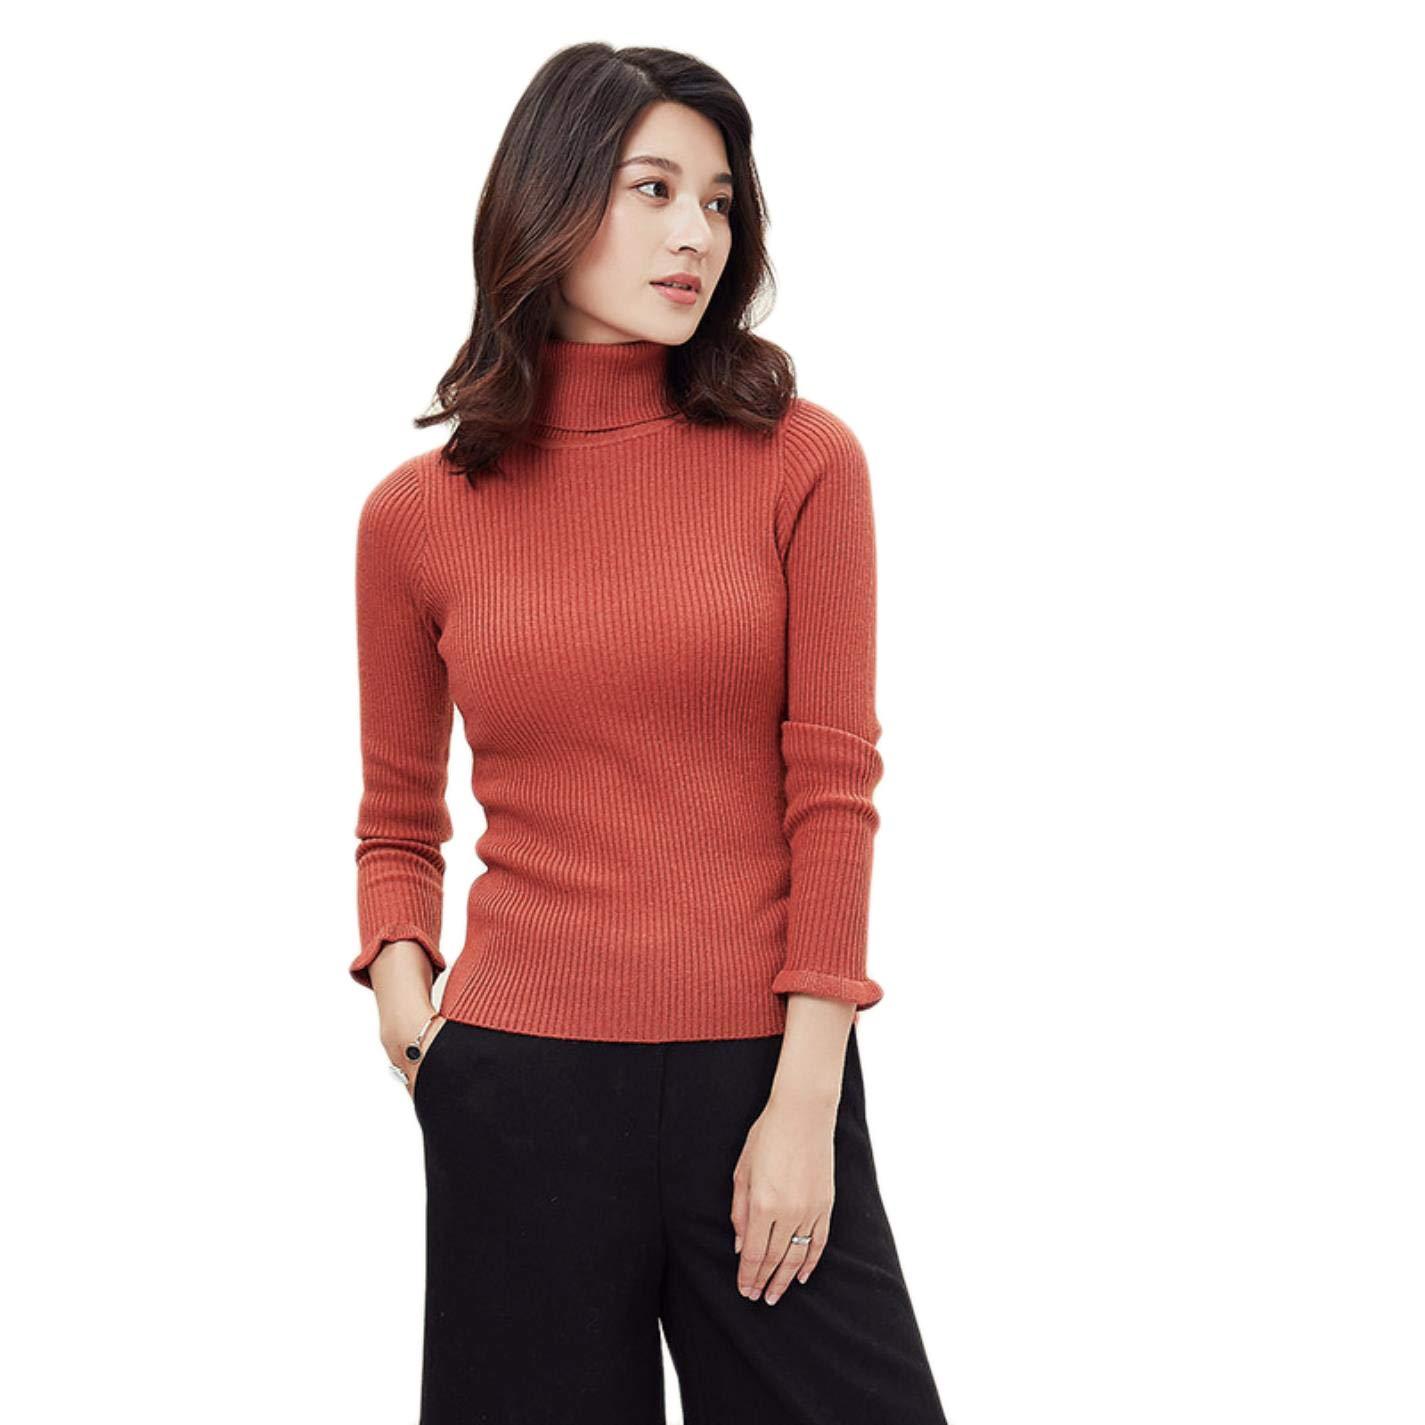 BlingGlri Womens Pure Cashmere Turtleneck Sweater Rib Knit Warm and Light